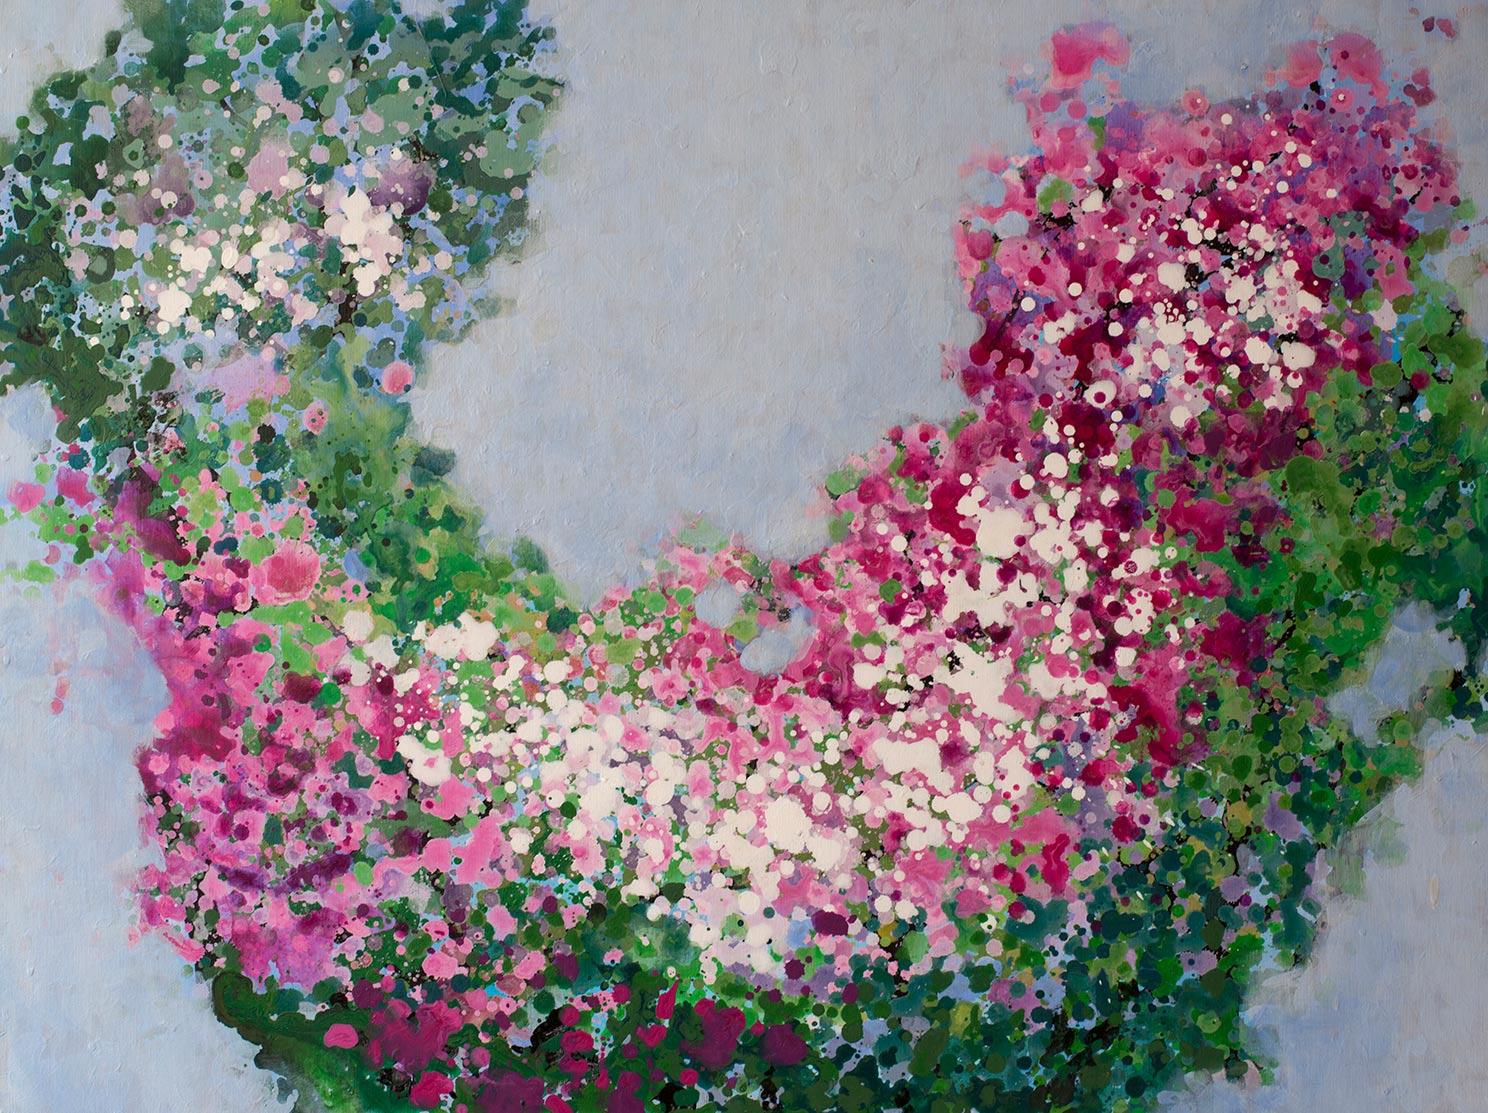 Abstract-painting-GiselleAyupova-121008-acrylic.jpg